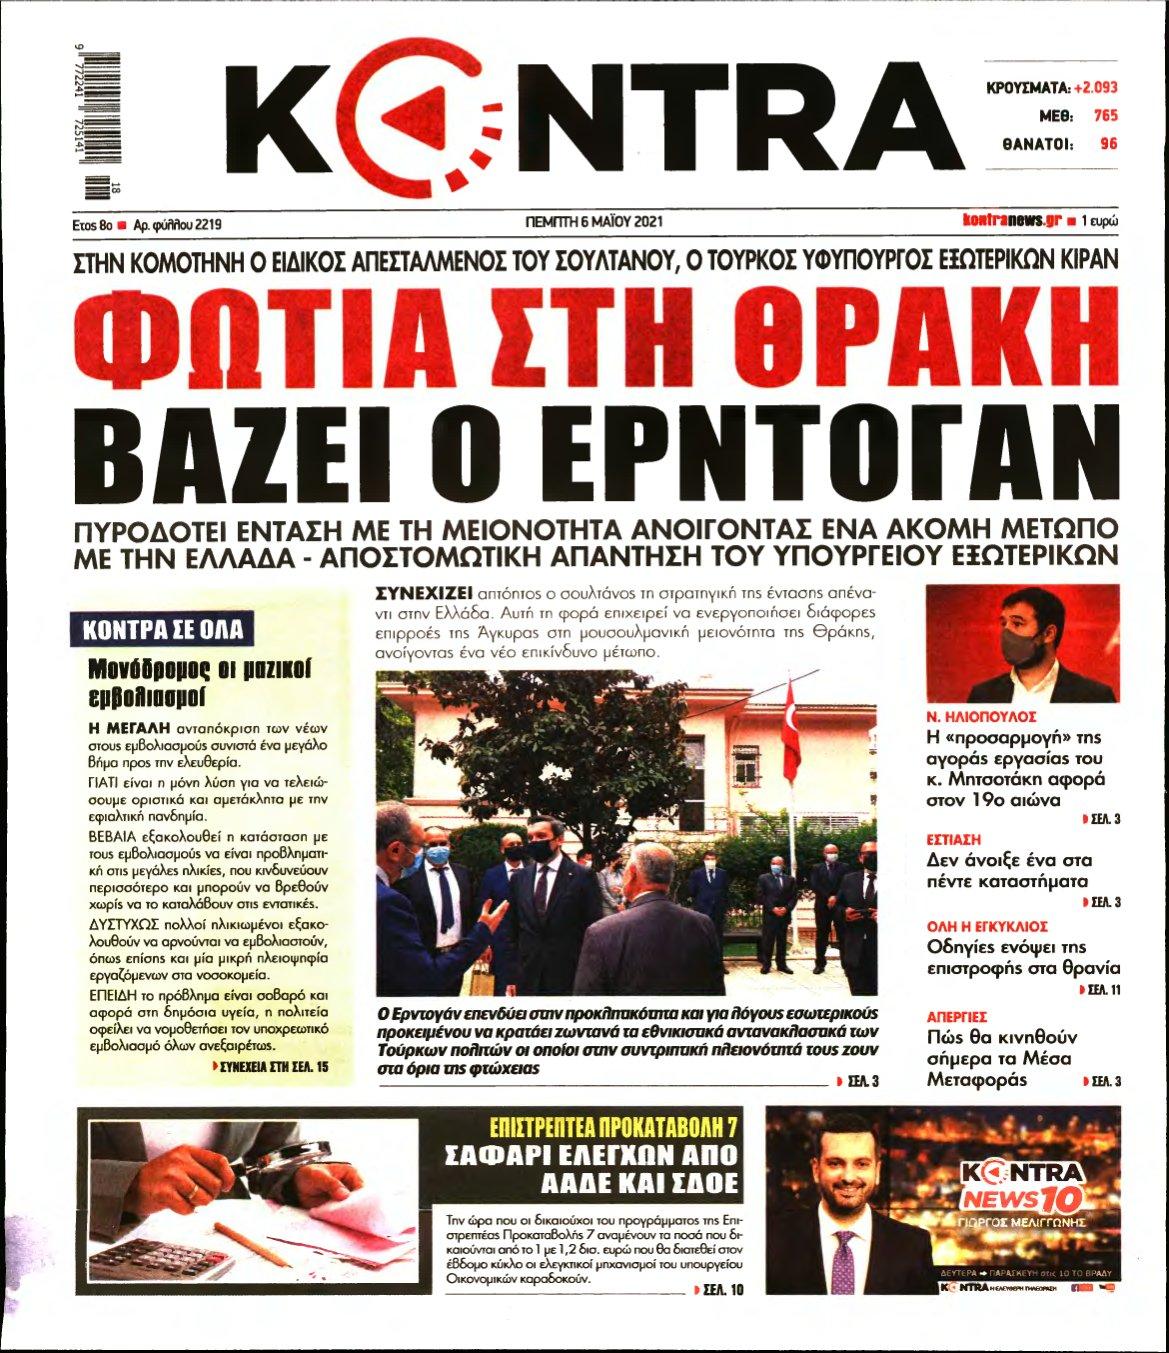 KONTRA NEWS – 06/05/2021